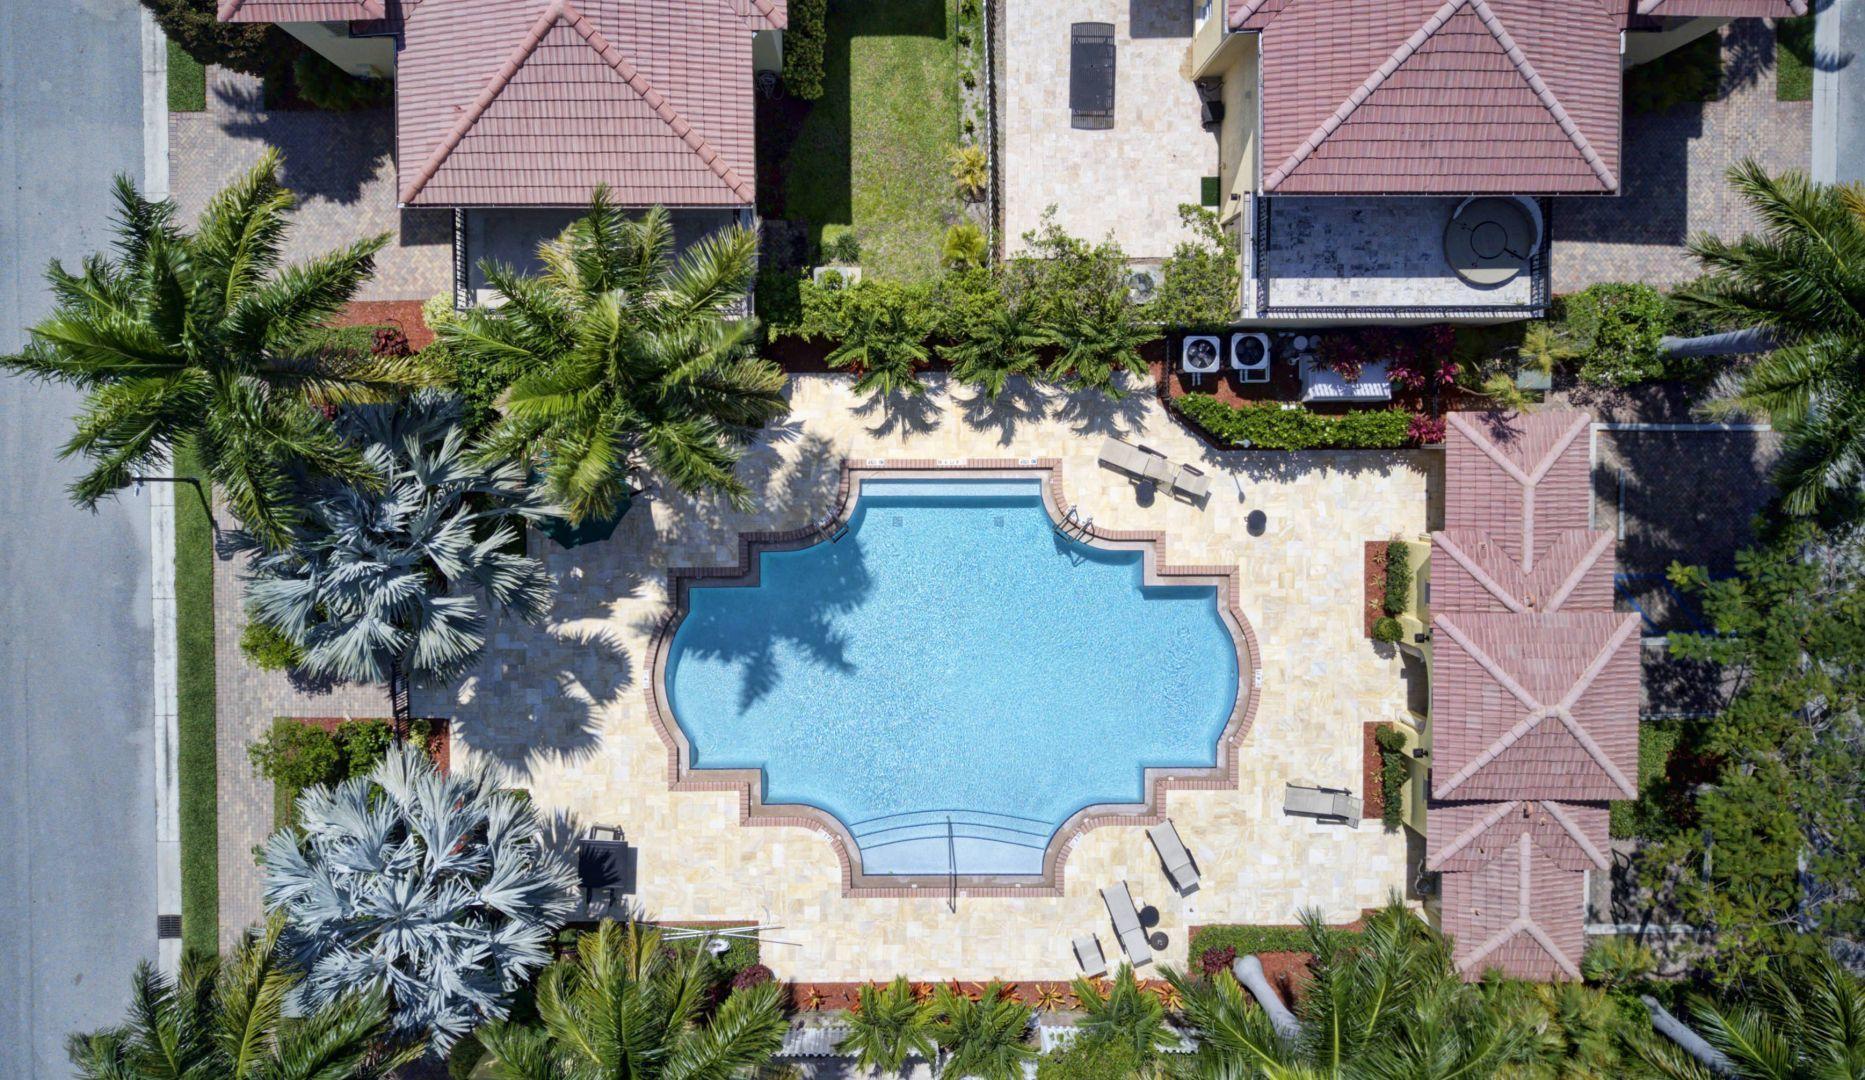 93 Via Floresta Drive, Boca Raton, FL 33487 $629,500 www